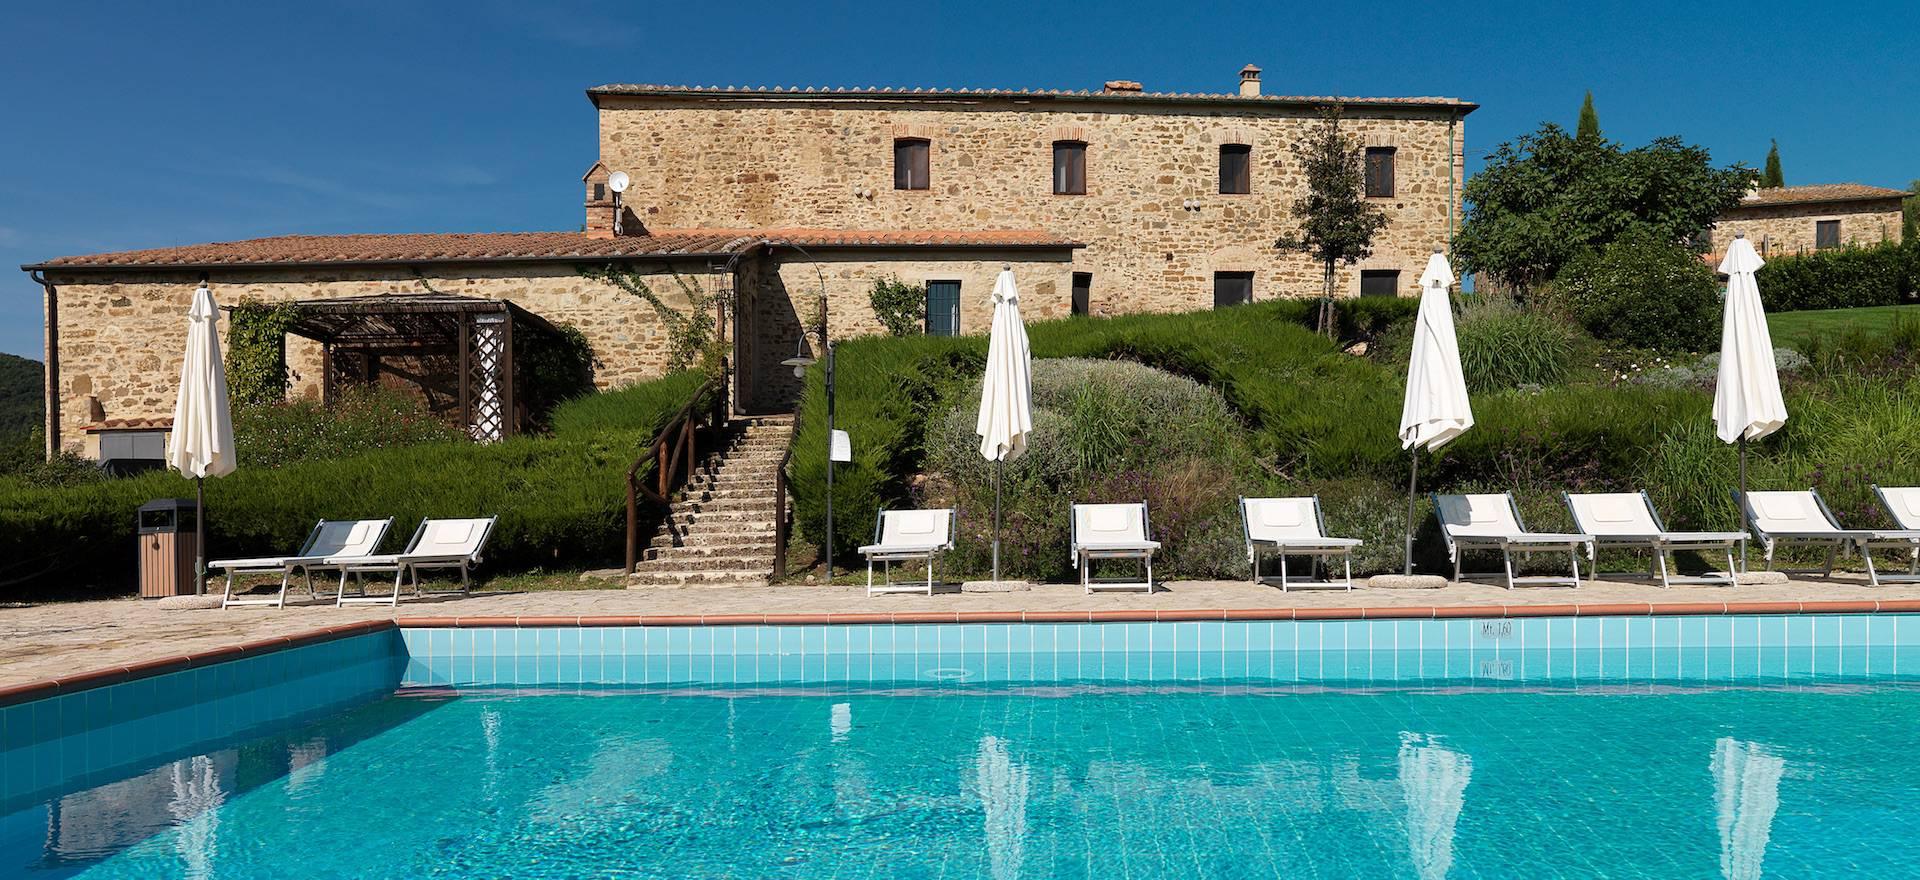 Agriturismo Toscane met smaakvol ingerichte appartementen